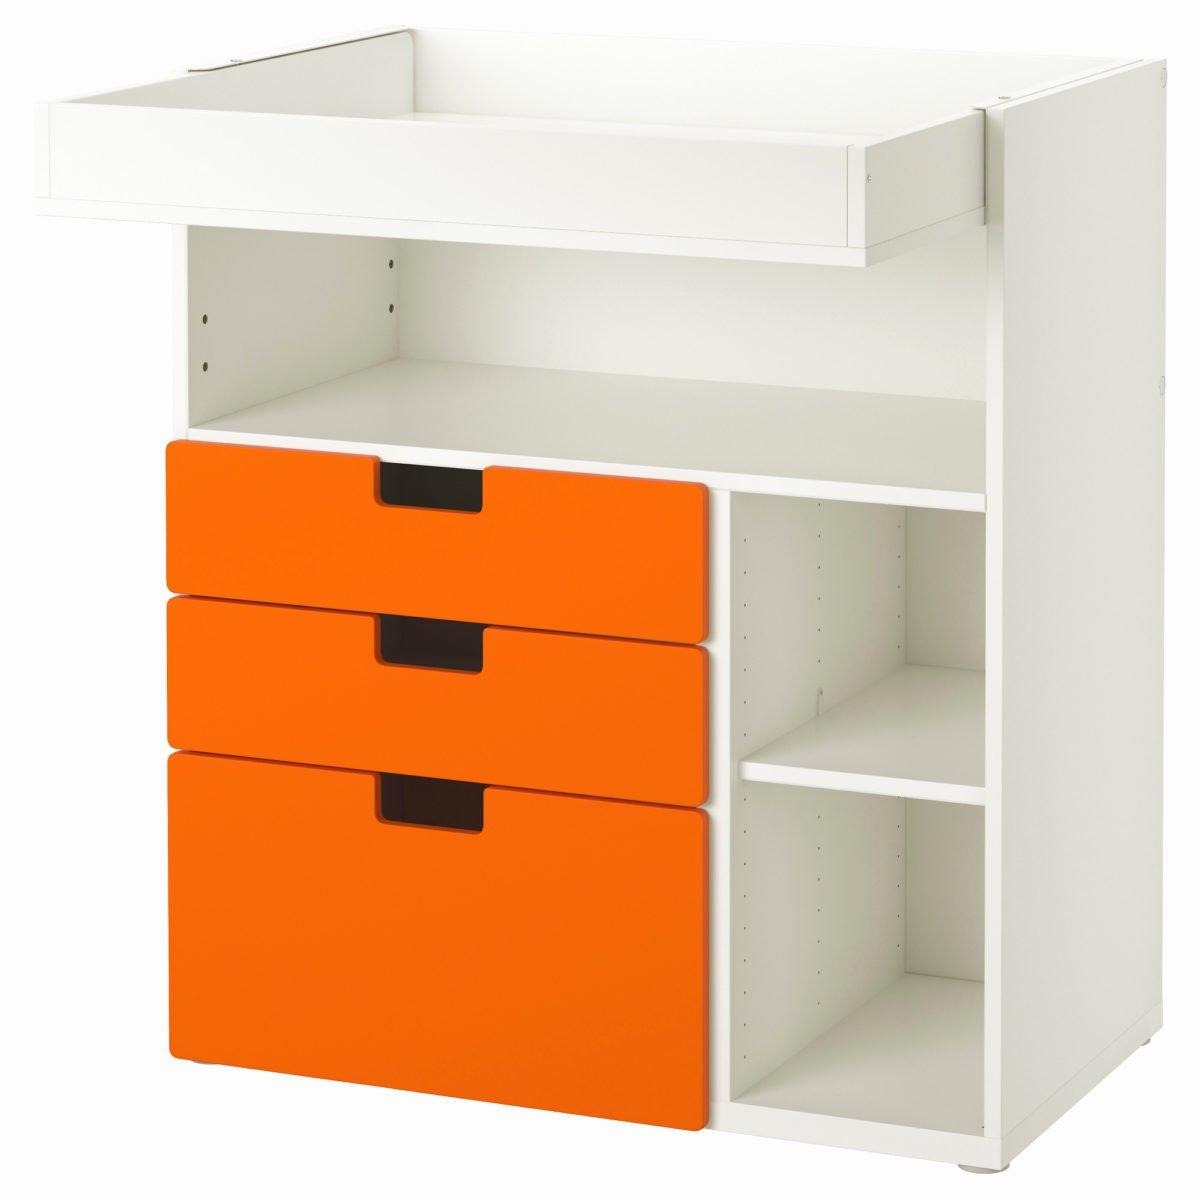 Catalogo camerette ikea 2019 - Ikea catalogo cassettiere ...